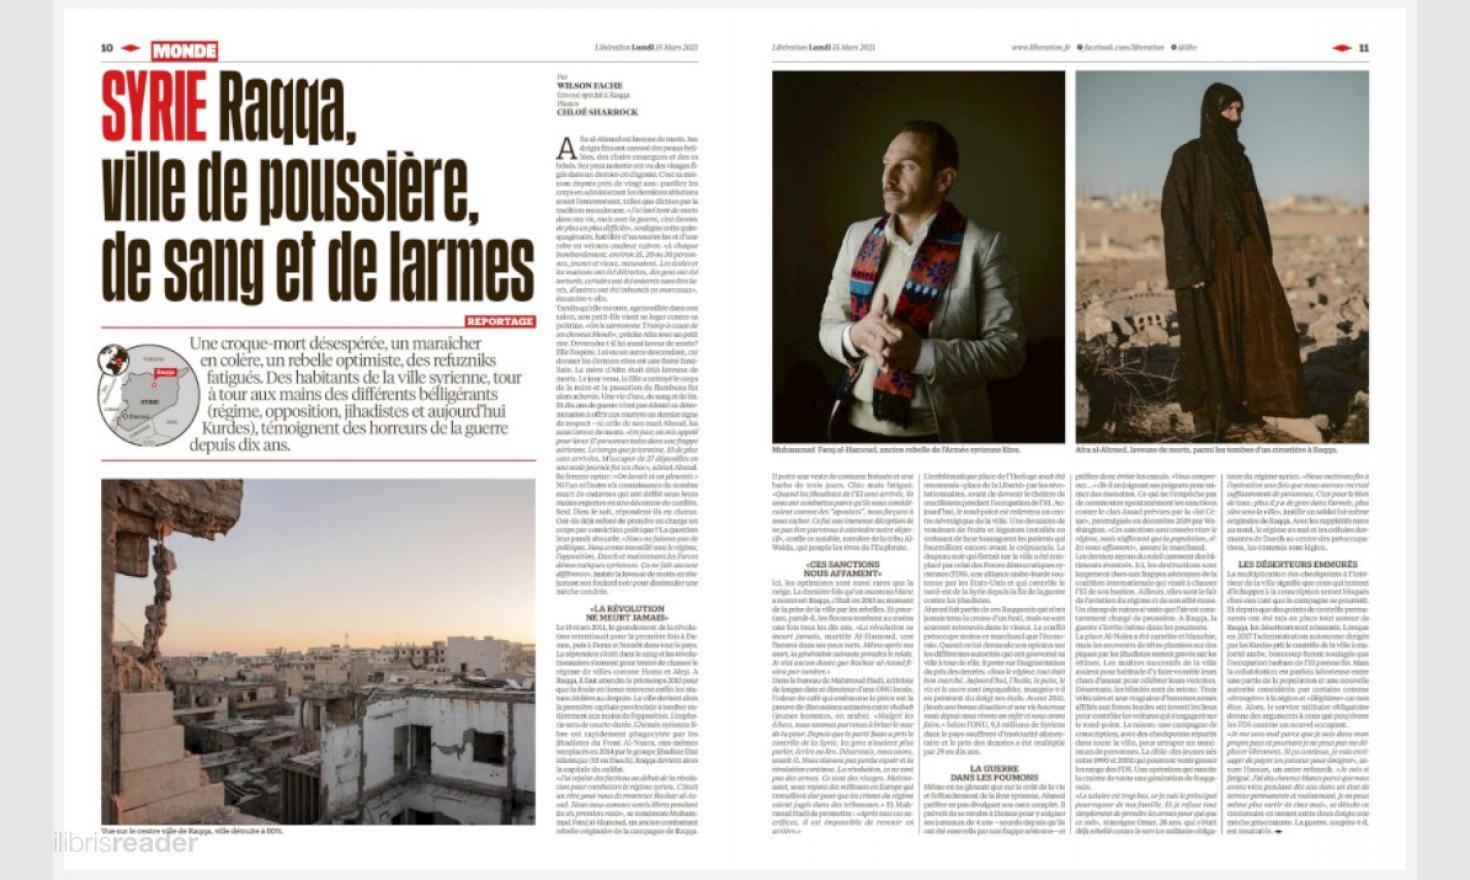 Syria, Raqqa - Libération March 15th 2021